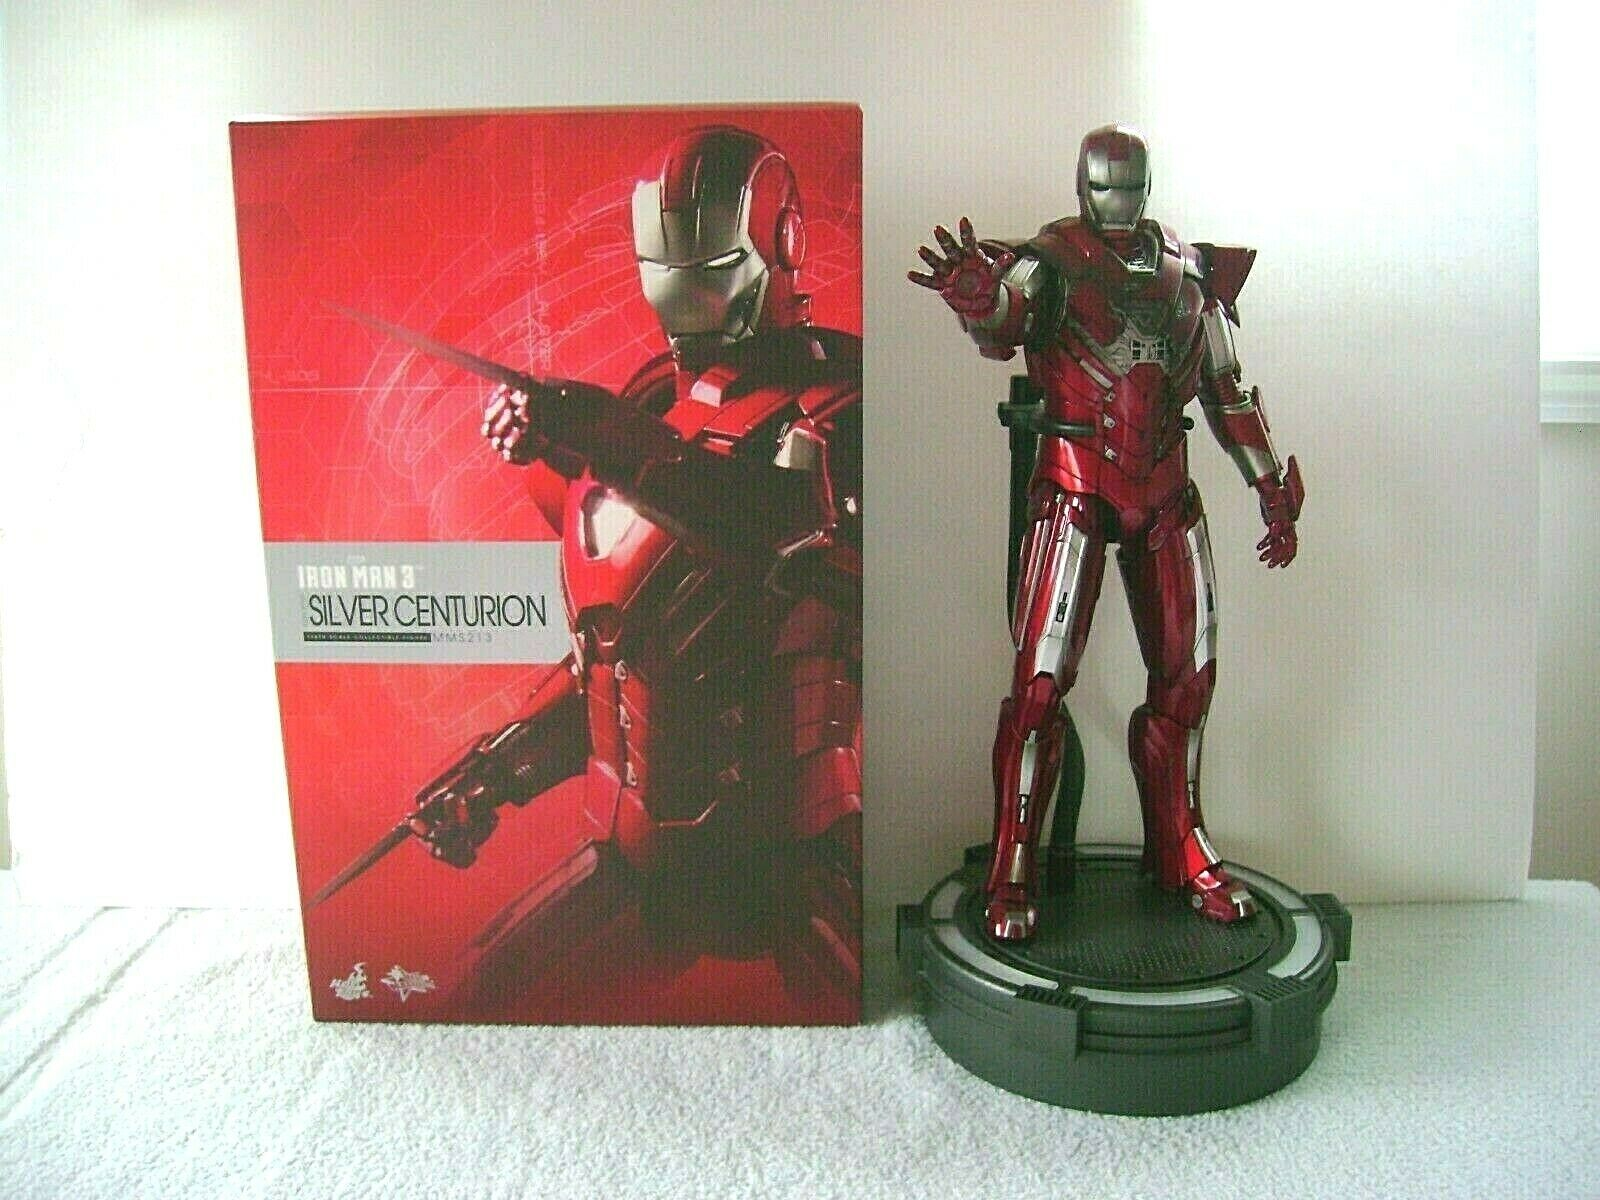 Hot Toys Iron Man 3 Silver Centurion Armor 1/6 Action Figure Used Marvel    on eBay thumbnail